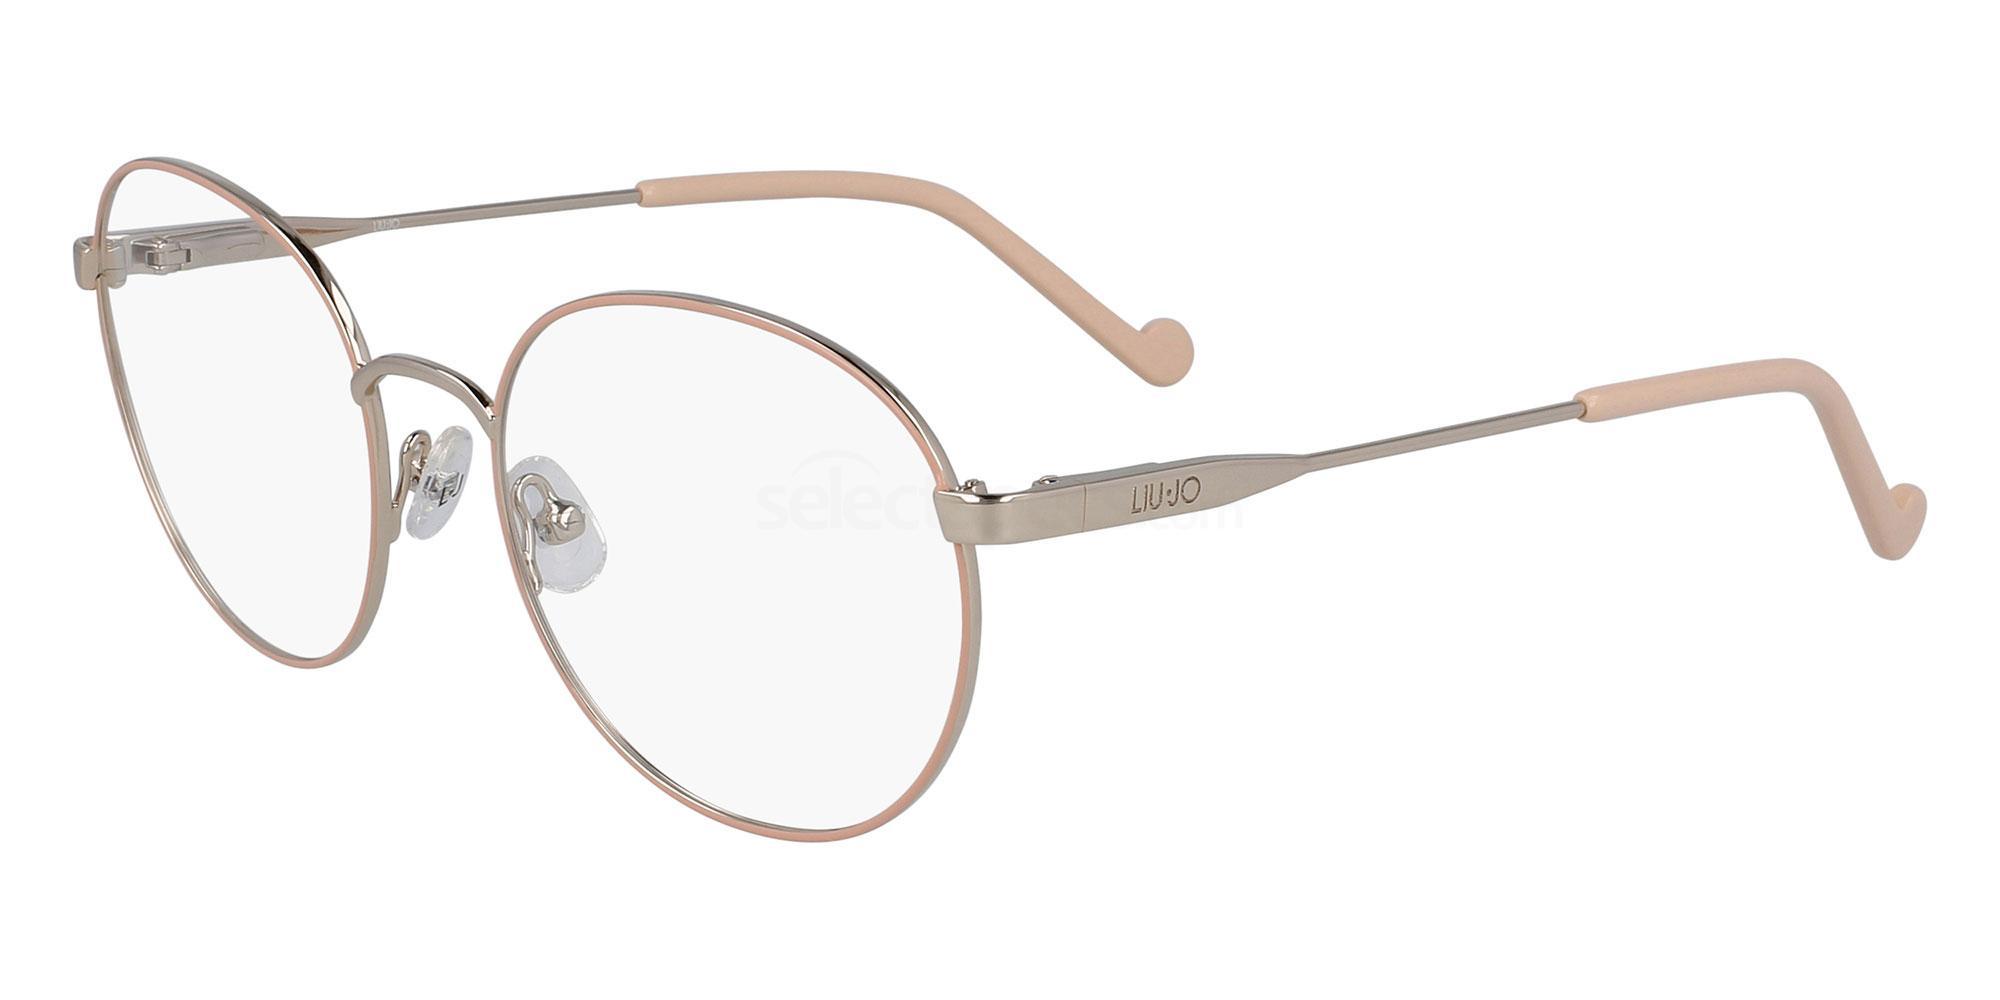 710 LJ2120 Glasses, Liu Jo